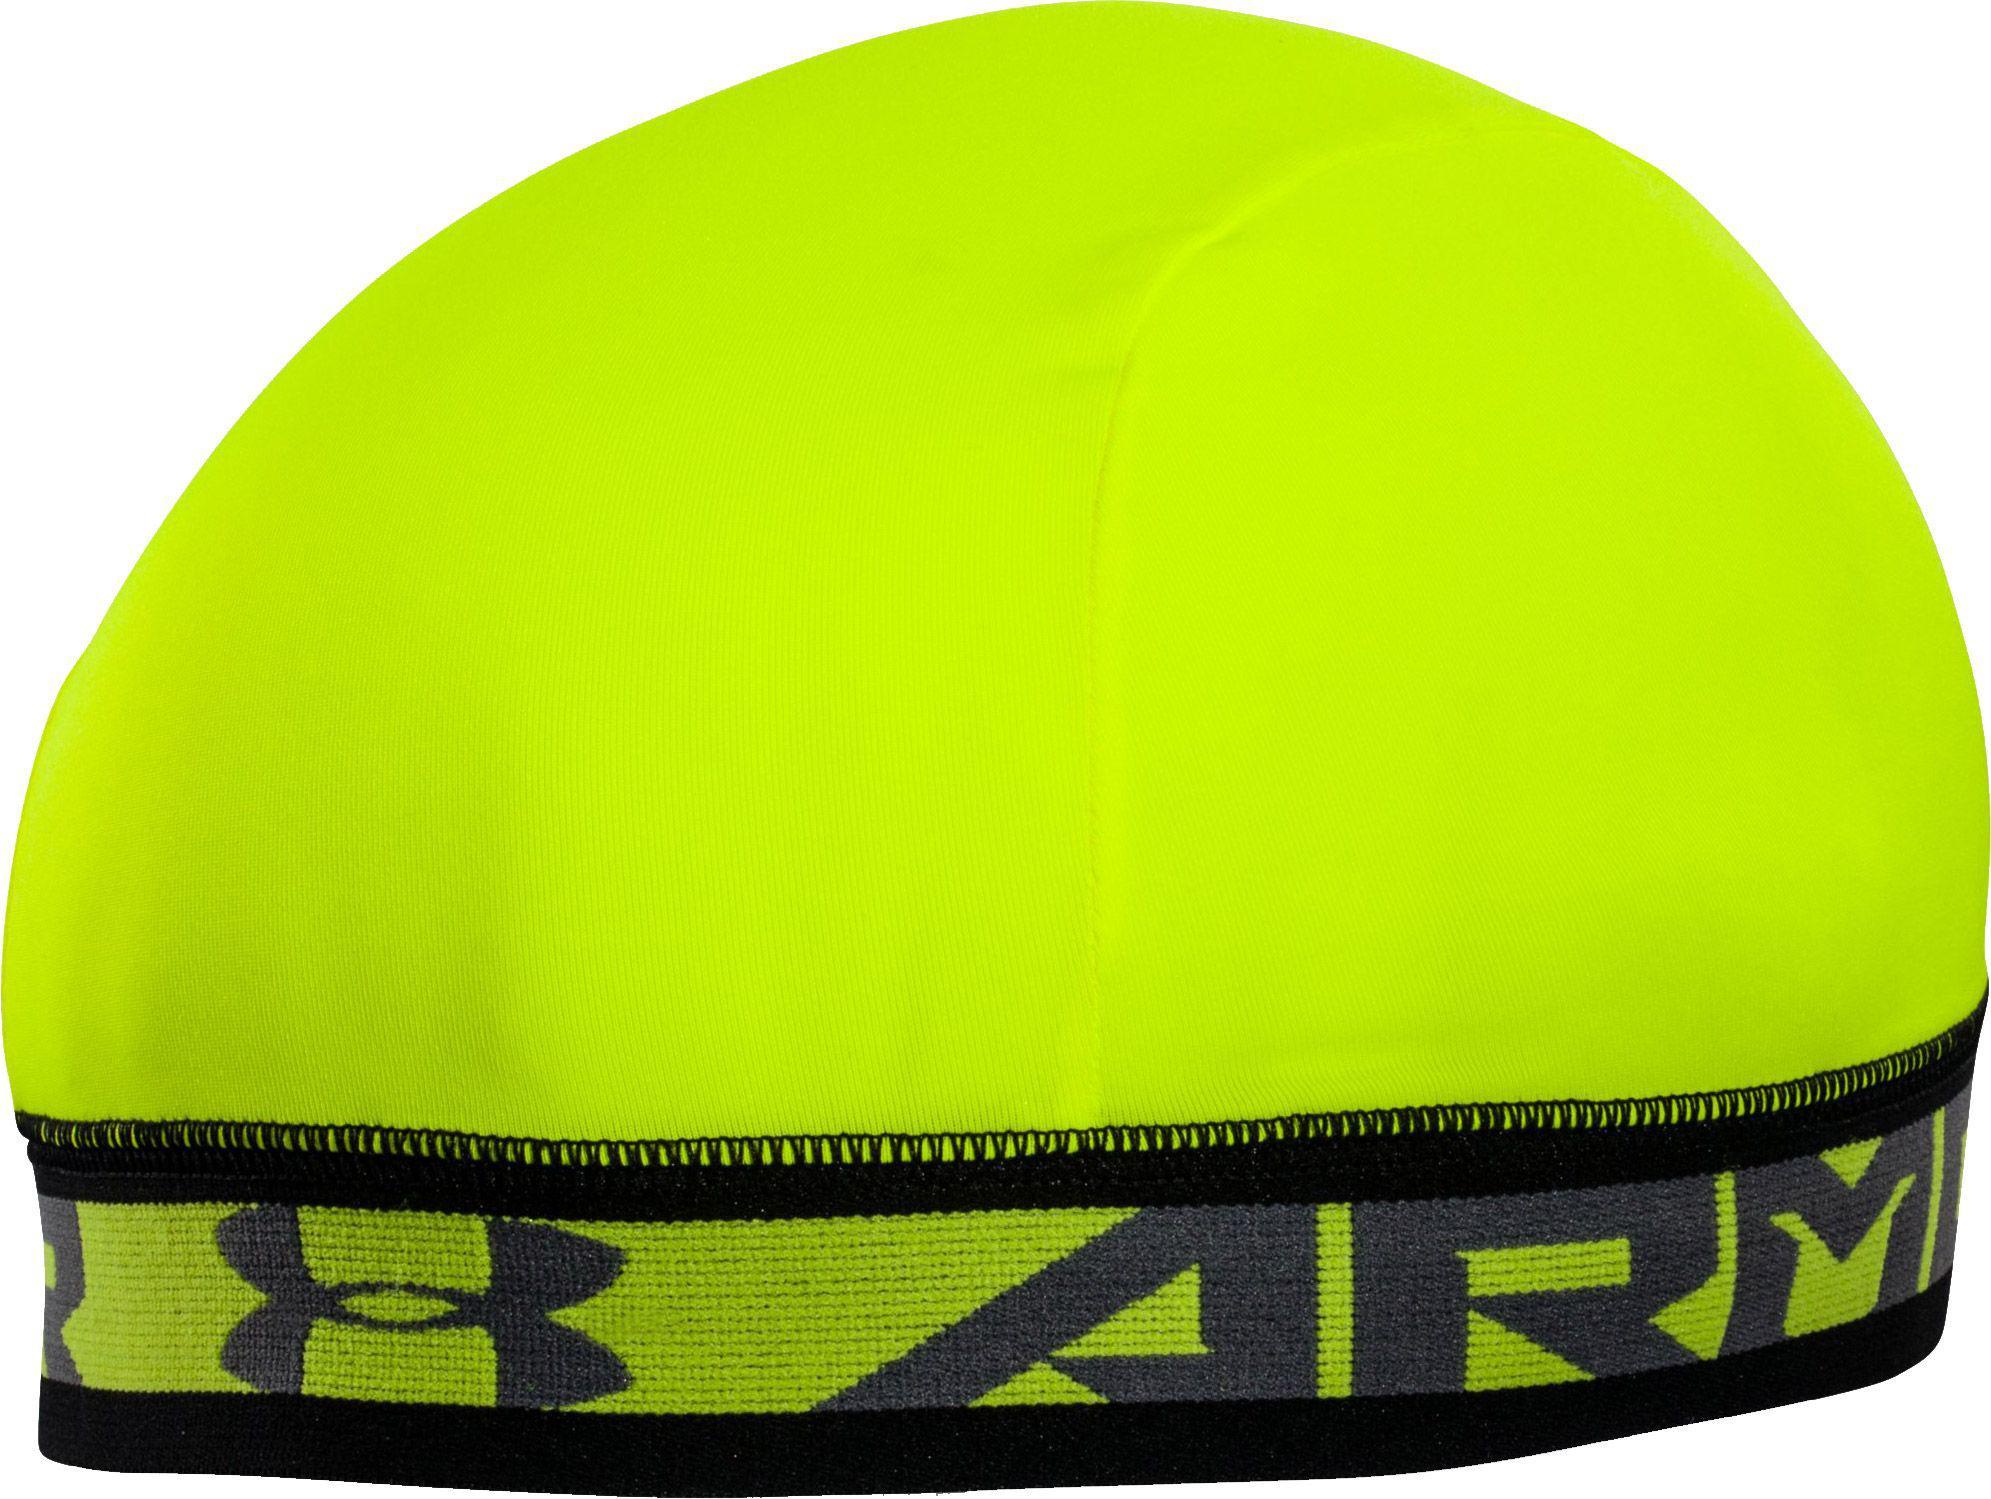 2684b6b2661 Lyst - Under Armour Original Skull Cap Ii in Yellow for Men